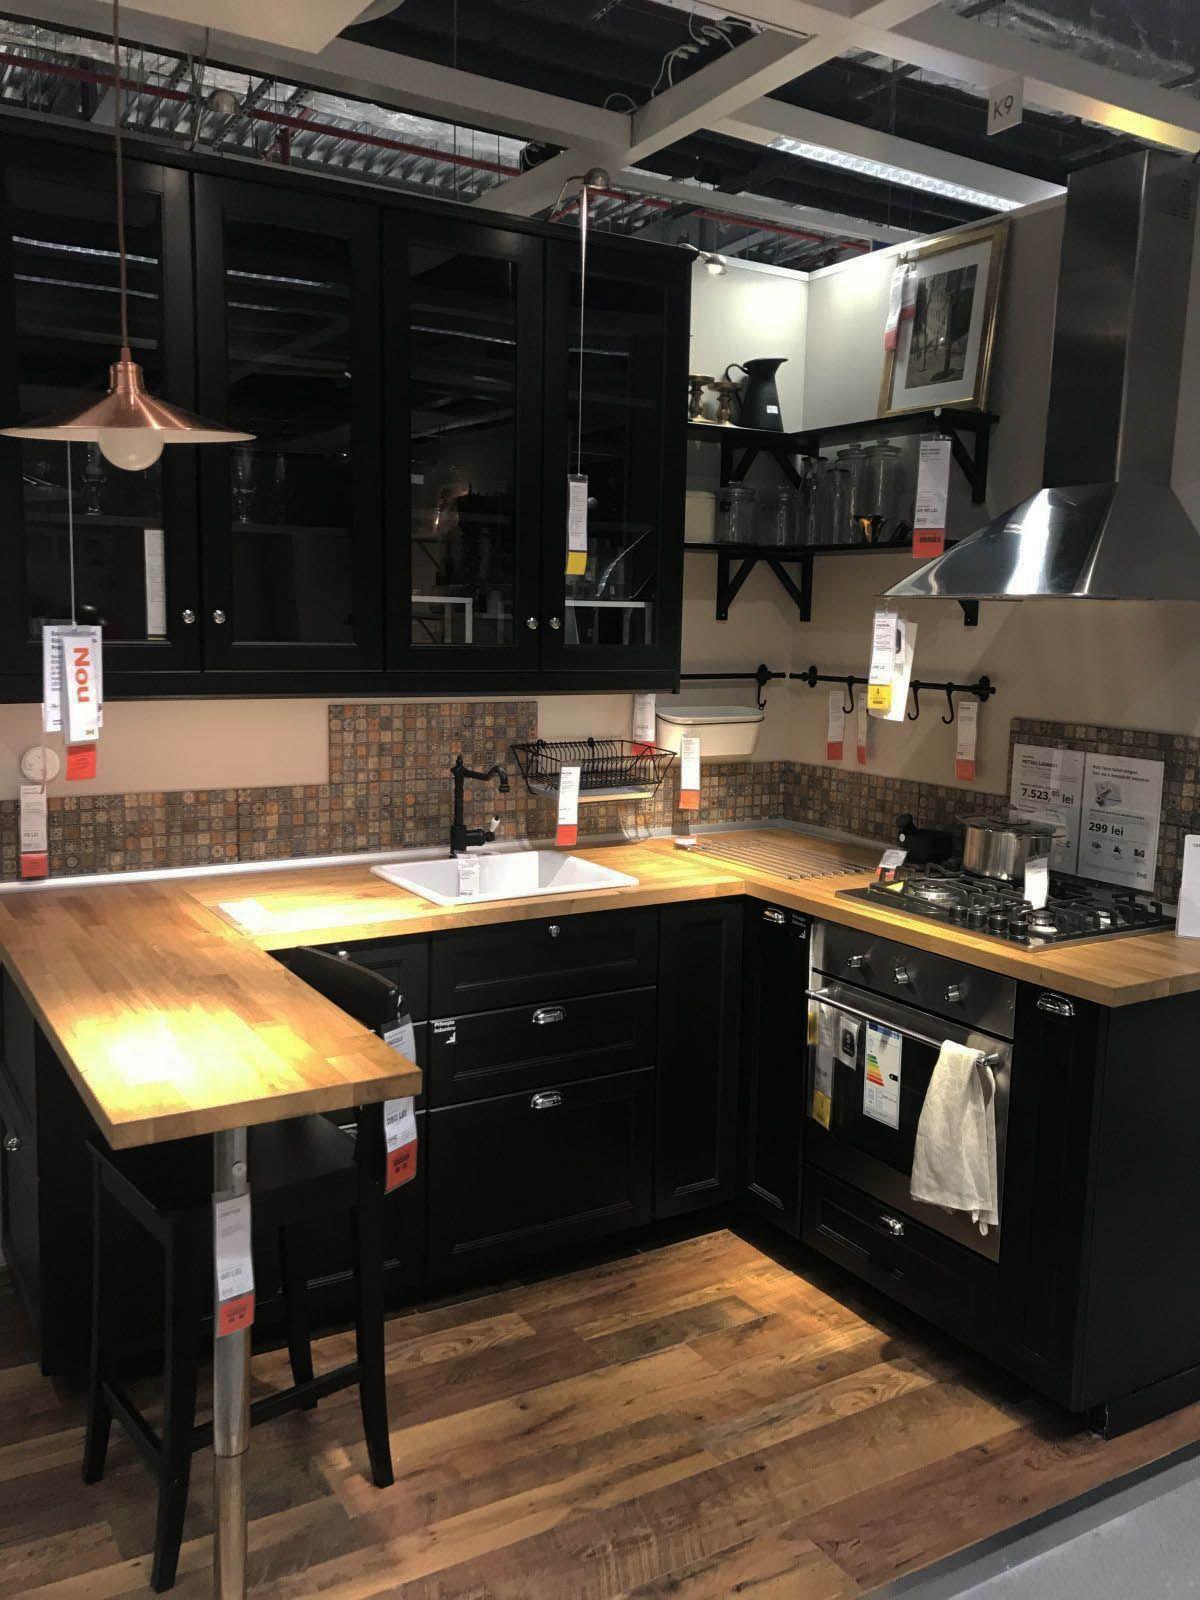 Elite ikea kitchen reddit for 2019 Küchendesign